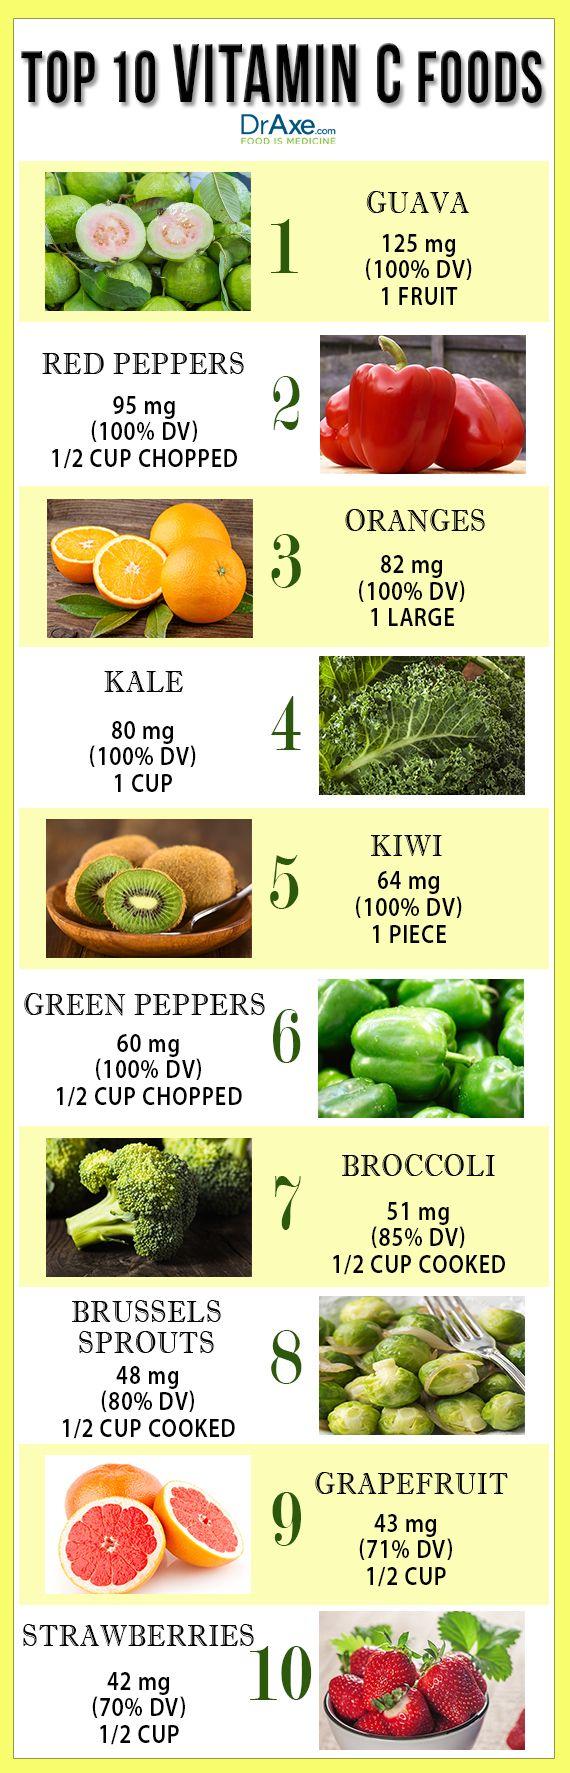 Watch Top 10 Niacin Rich Foods video